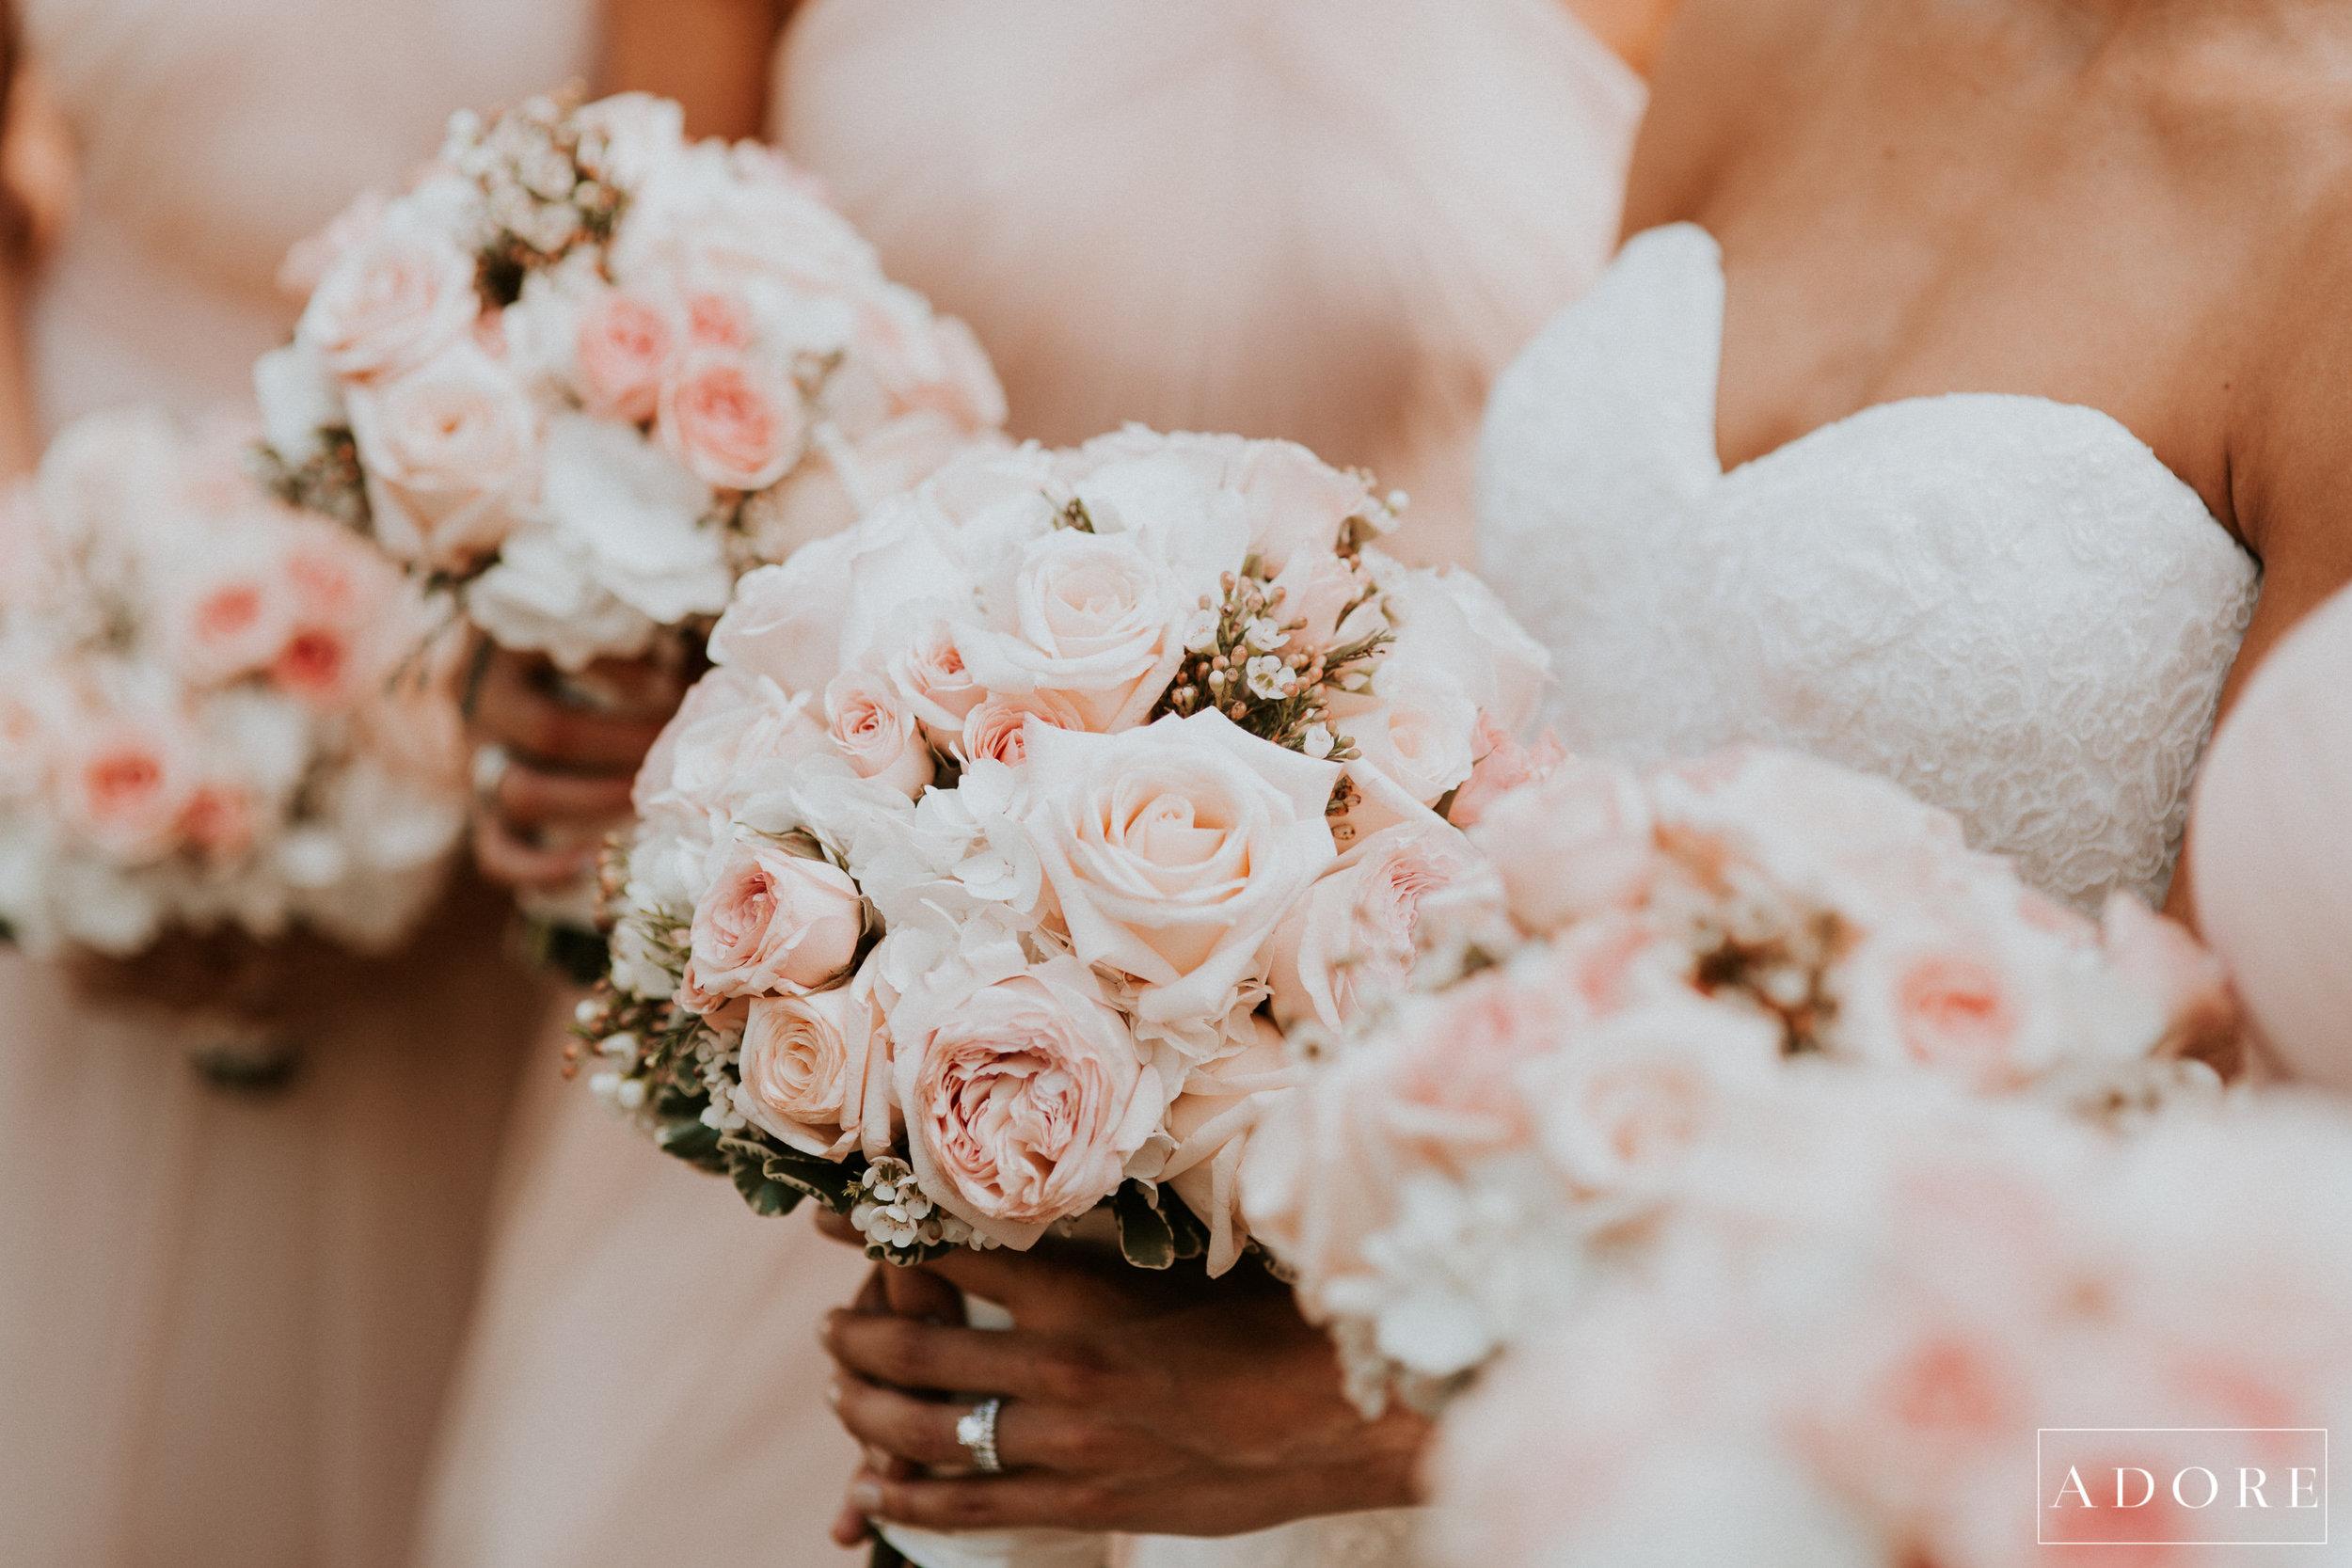 Adore Wedding Photography-17492.jpg